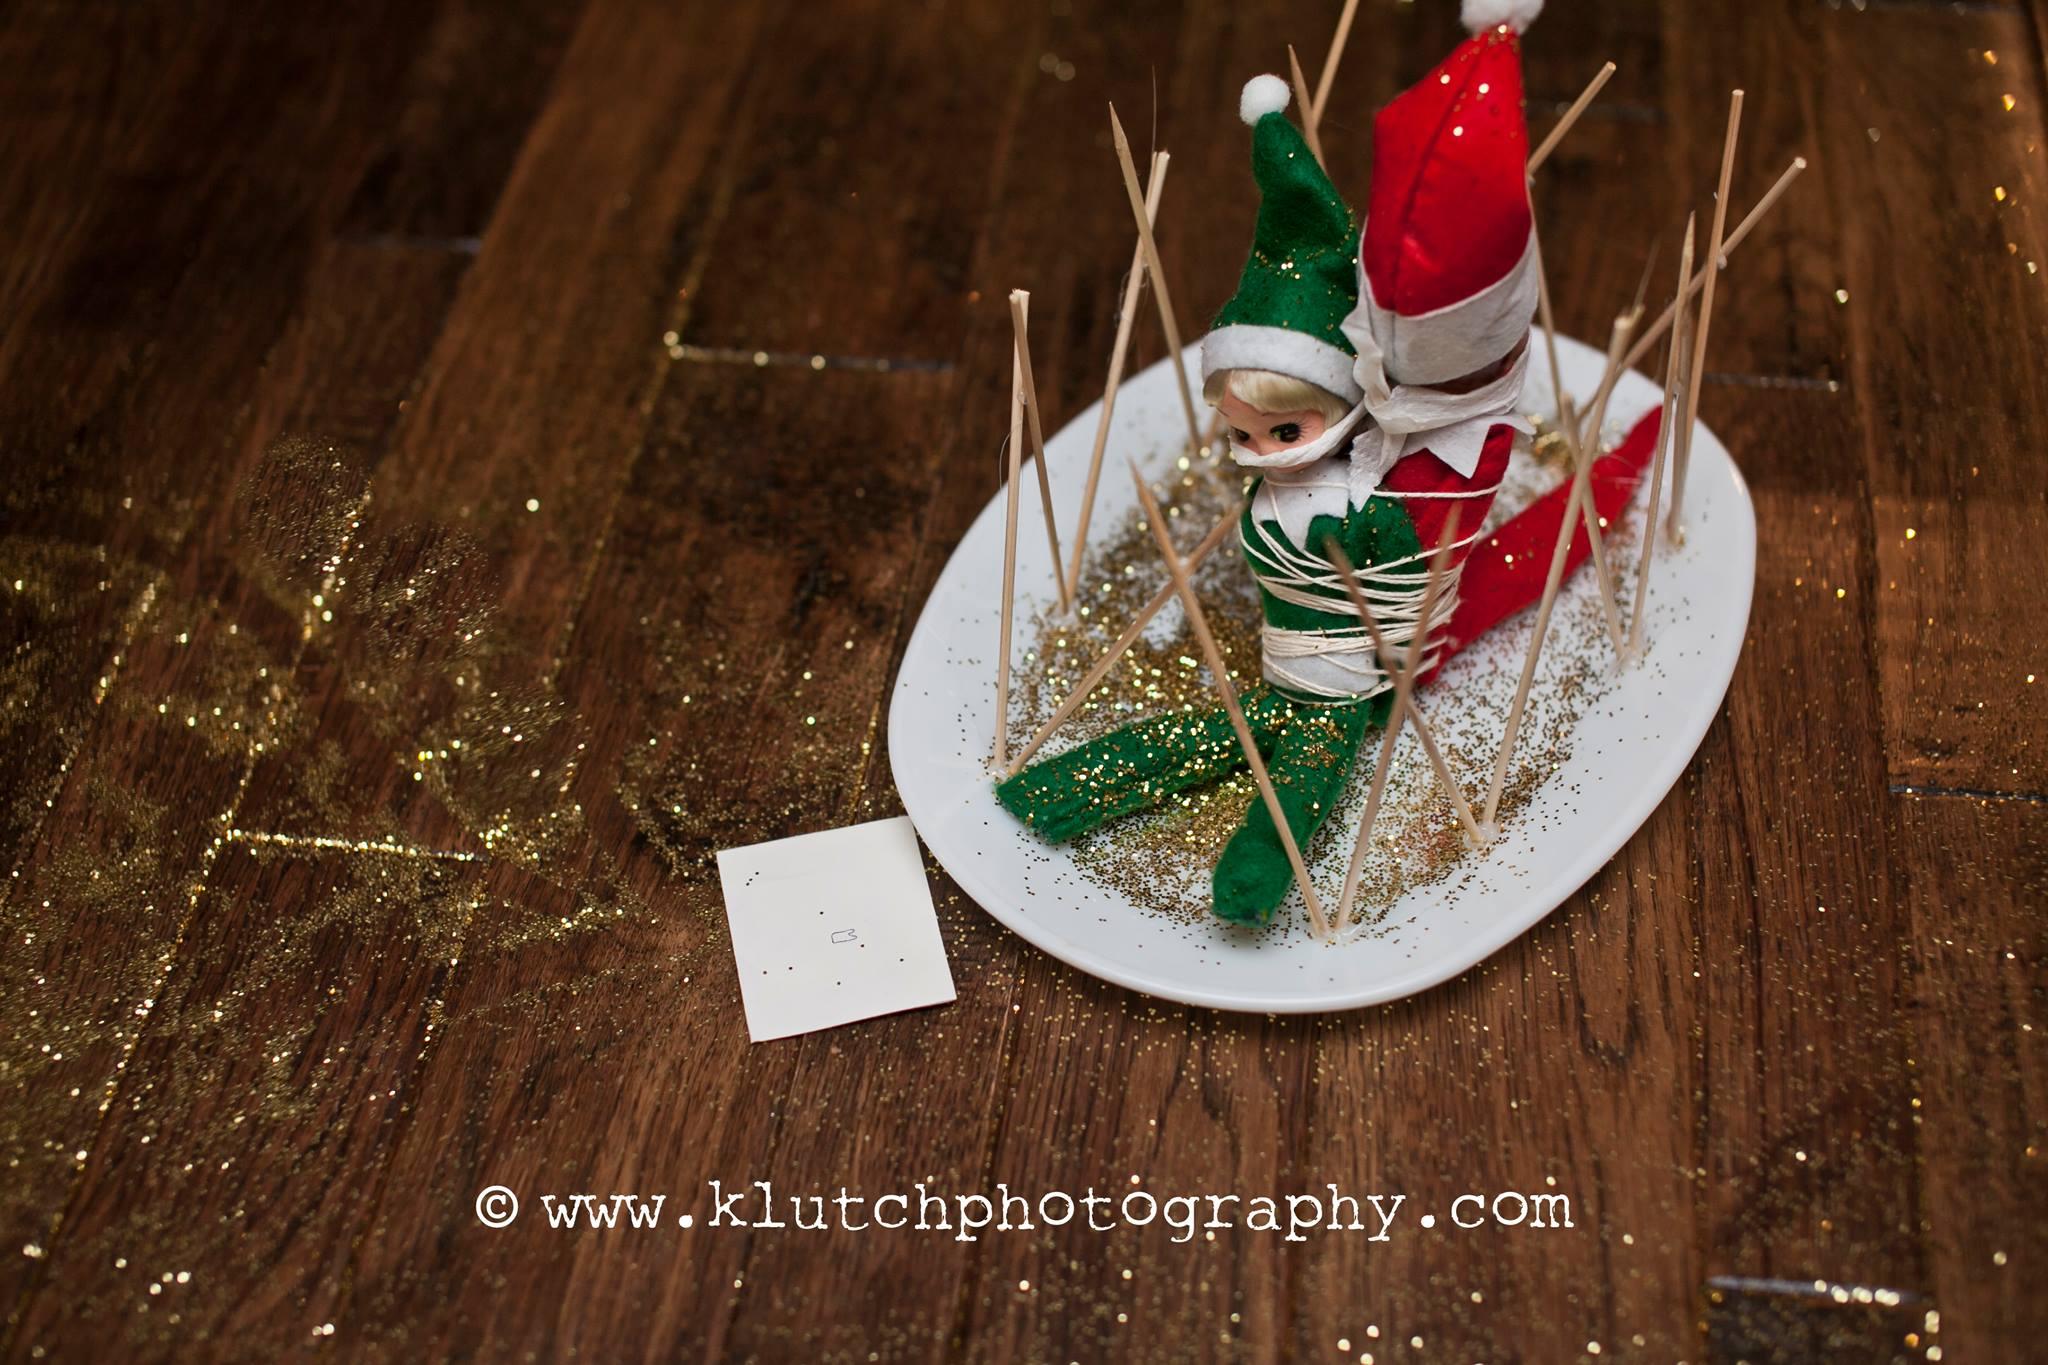 Klutch Photography, family photographer, elf on the shelf, vancouver family photographer, whiterock family photographer, lifeunscripted photographer, lifestlye photographer x.jpg